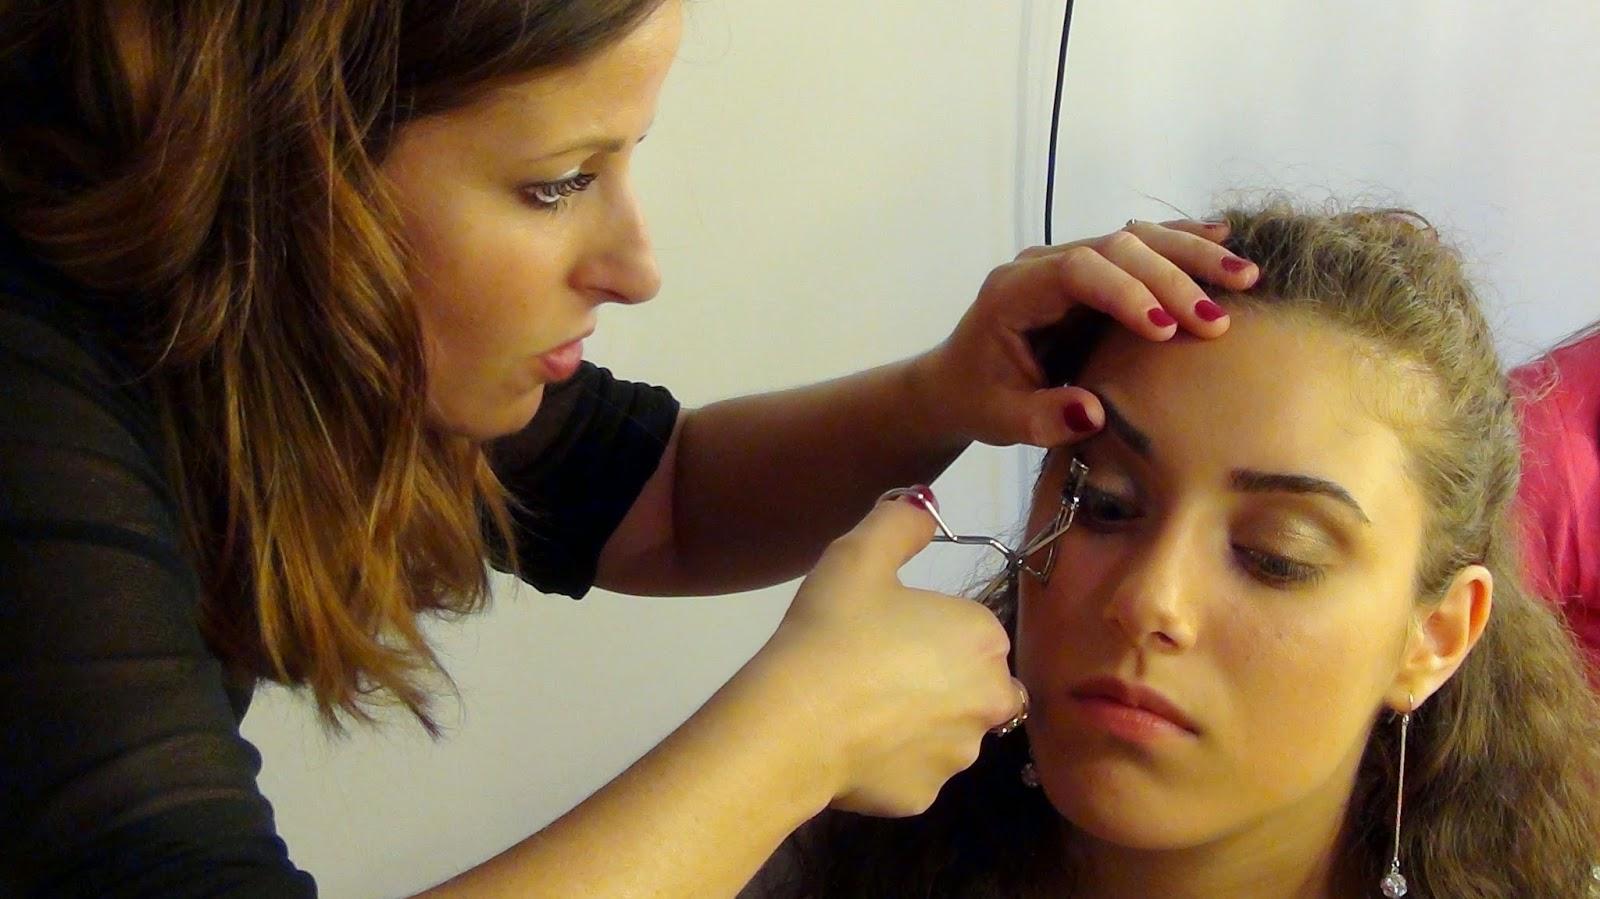 clio make up tutorial trucco, clio make up, cliomakeup colgate, colgate max white one optic, cliomakeup concorso